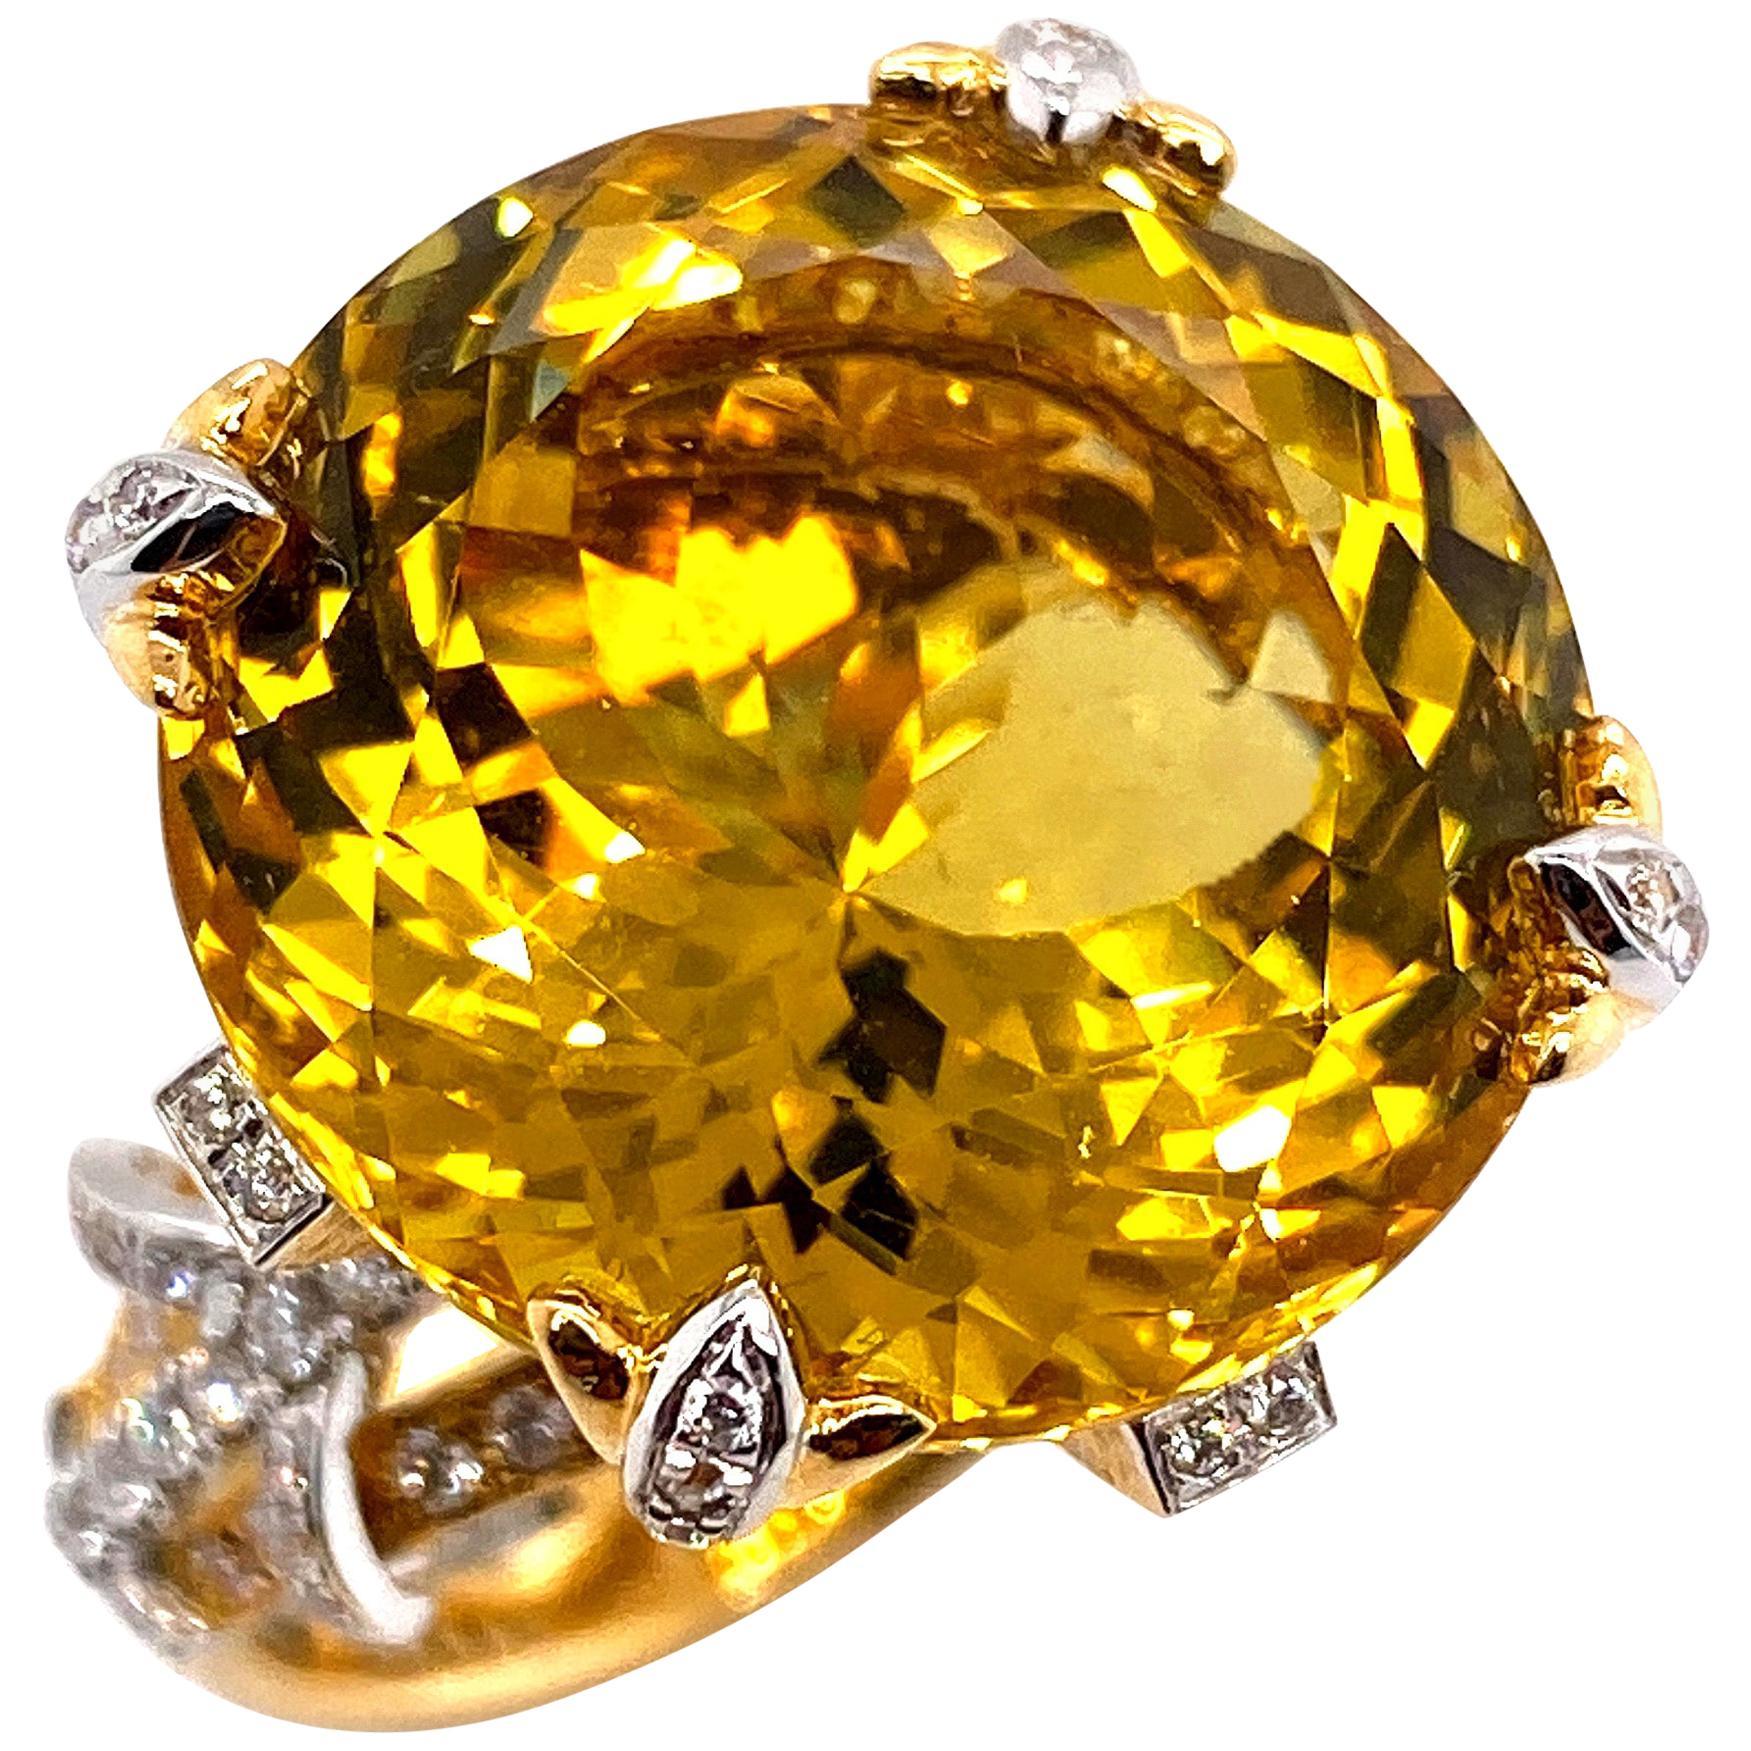 Certified 19.06 Carat Natural Yellow Beryl and Diamond Statement Ring